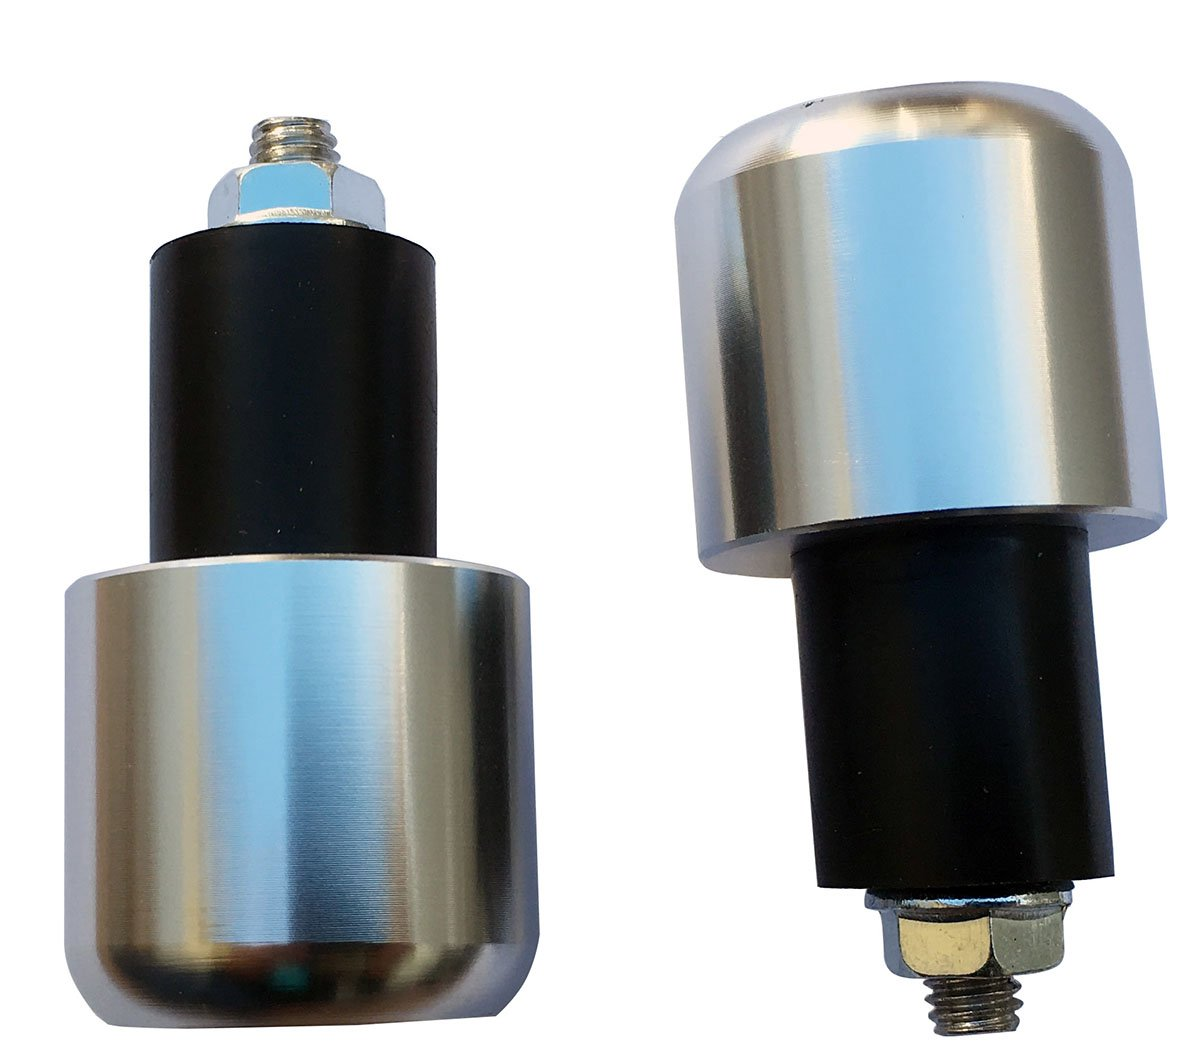 Silver 7//8 22mm Handle Bar End Weights Plugs Grips Cap Sliders for 2003 Suzuki Burgman 650